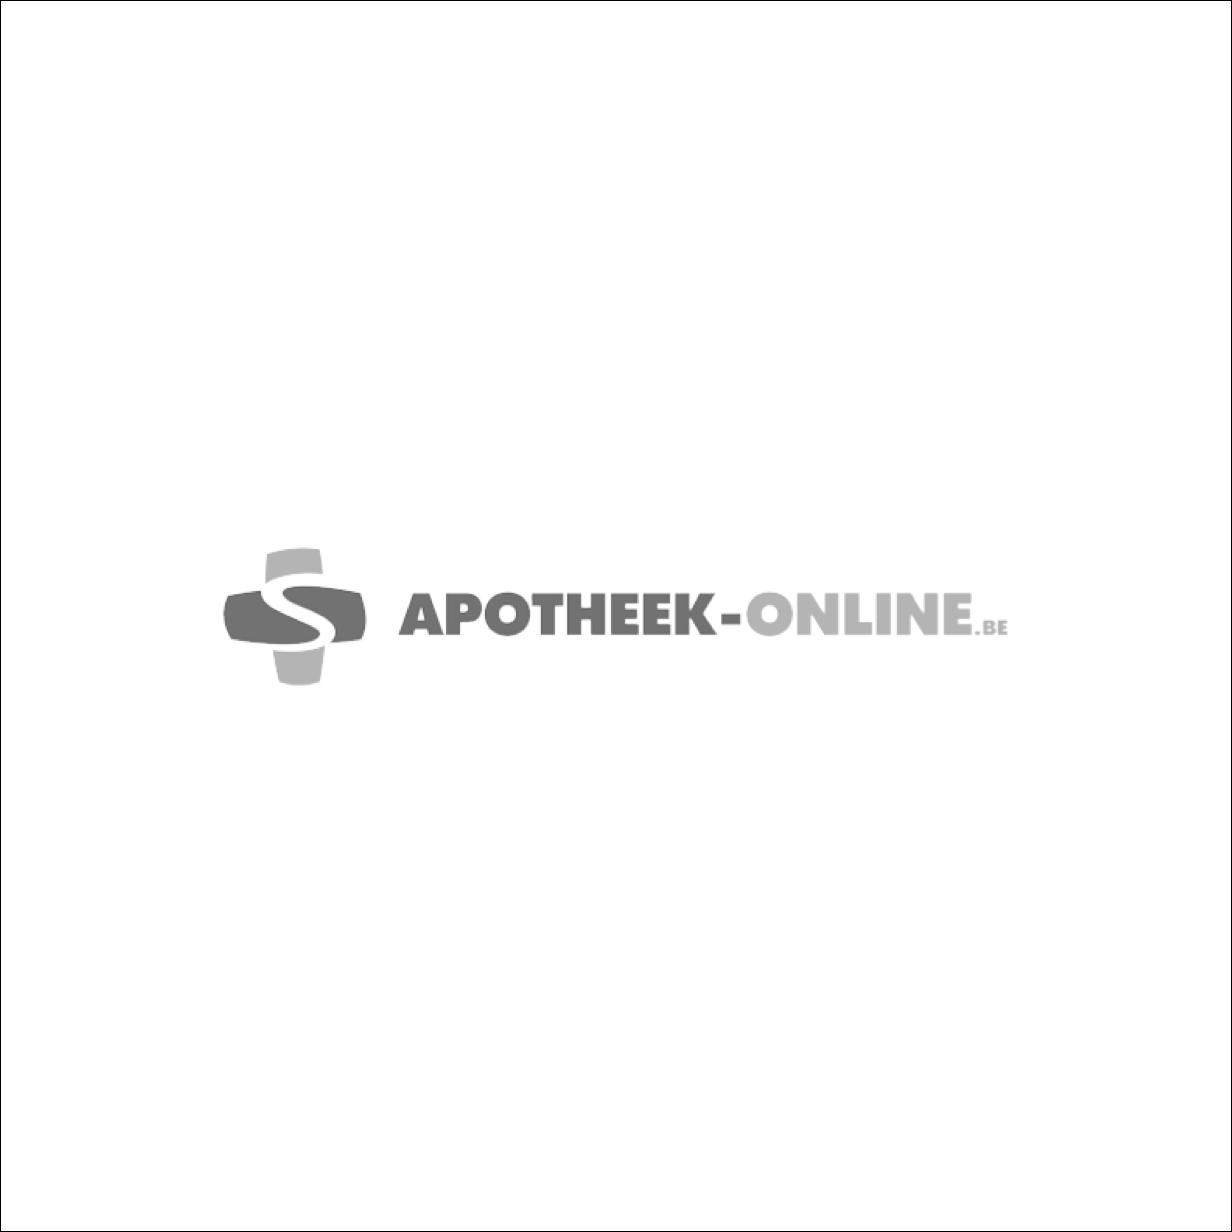 MESOFT CP N/ST 4C 5,0X 5,0CM 300